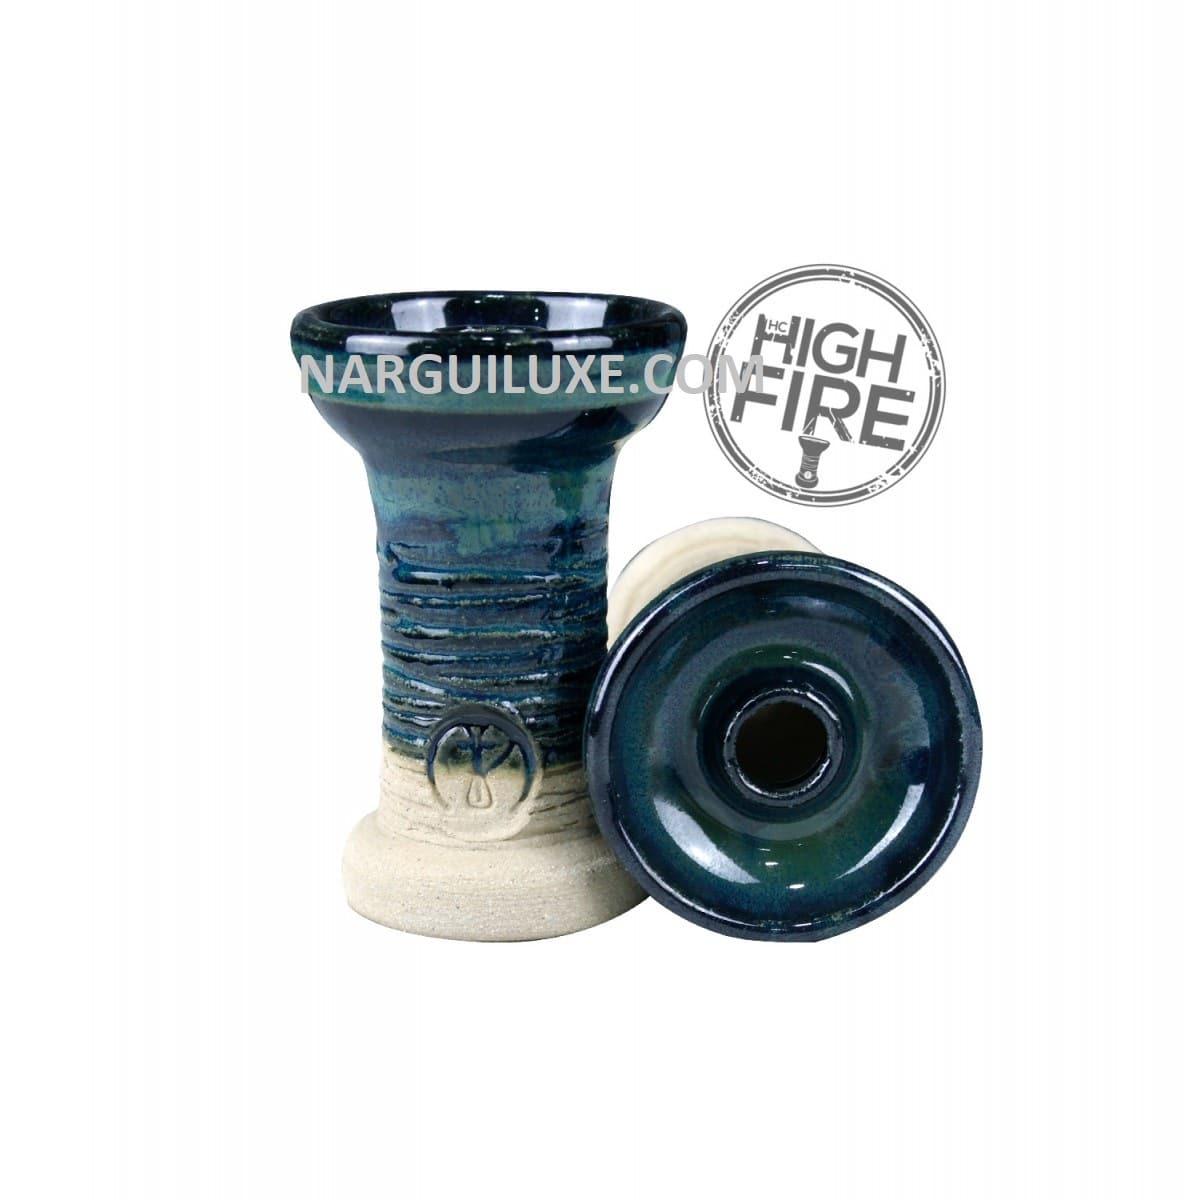 cazoleta_hc_highfire-submarine-1-1200x1200 Foyer hc high fire narguiluxe.com